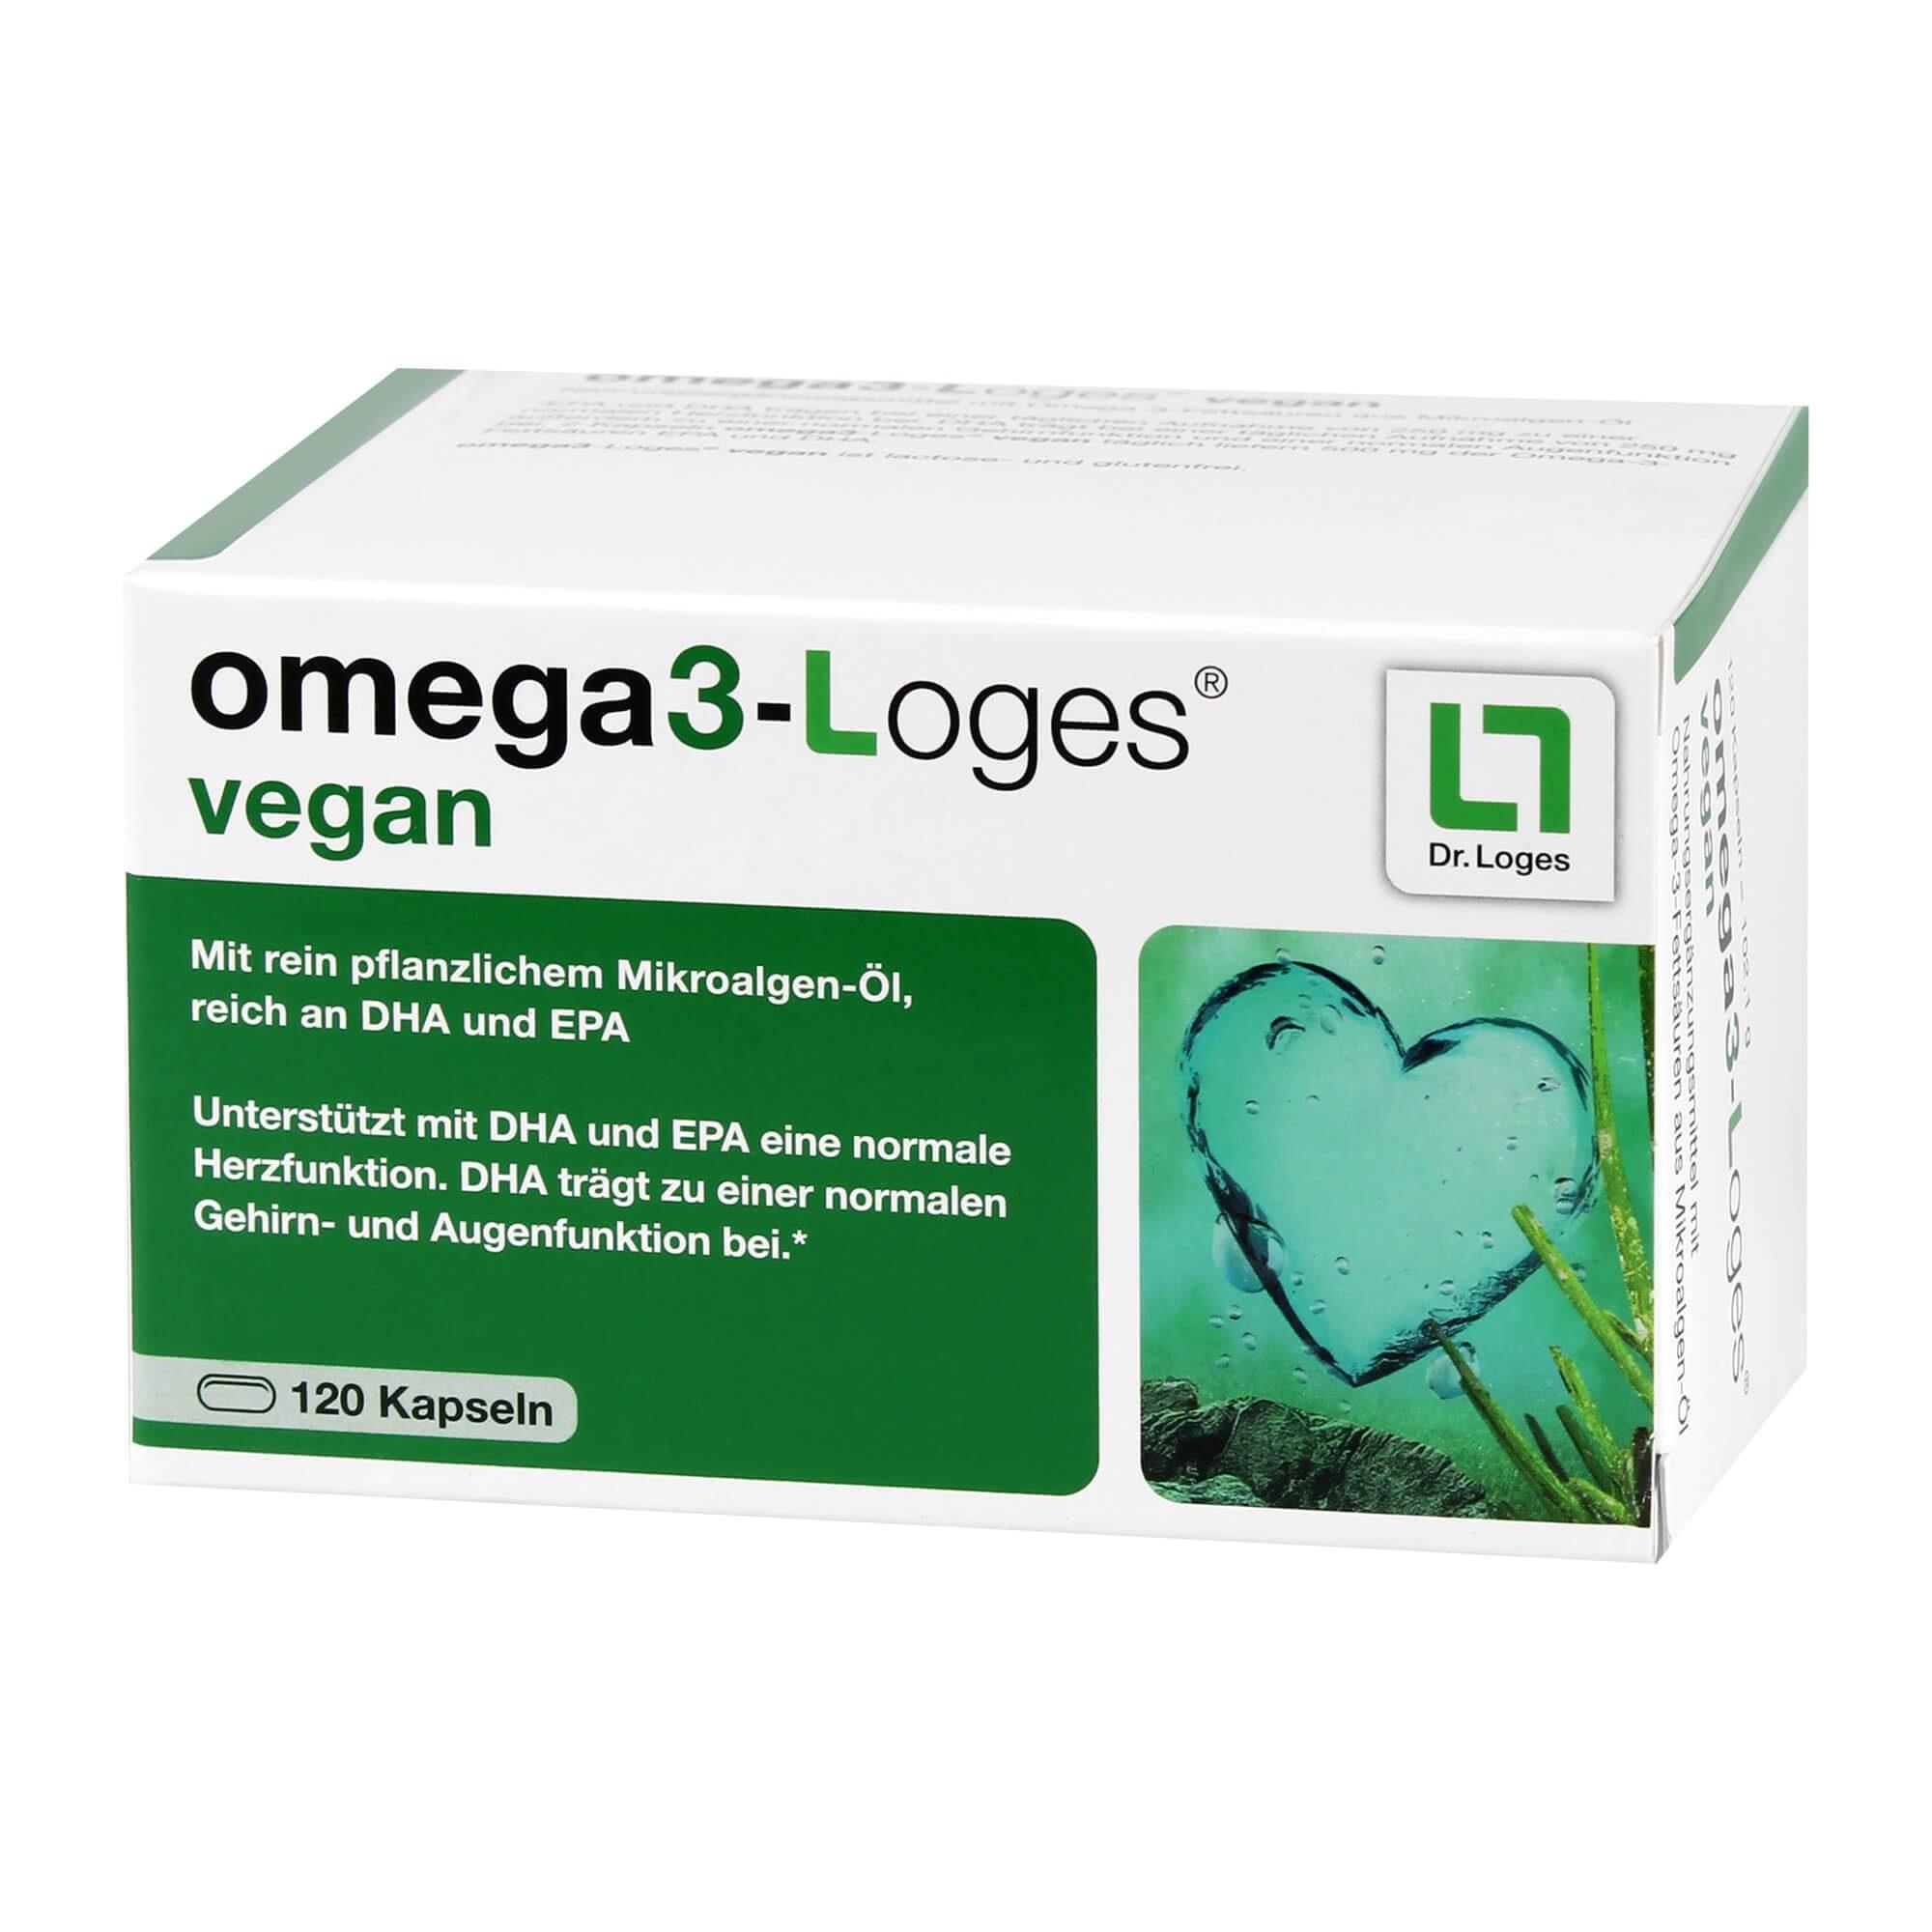 Omega 3-Loges Vegan Kapseln, 120 St